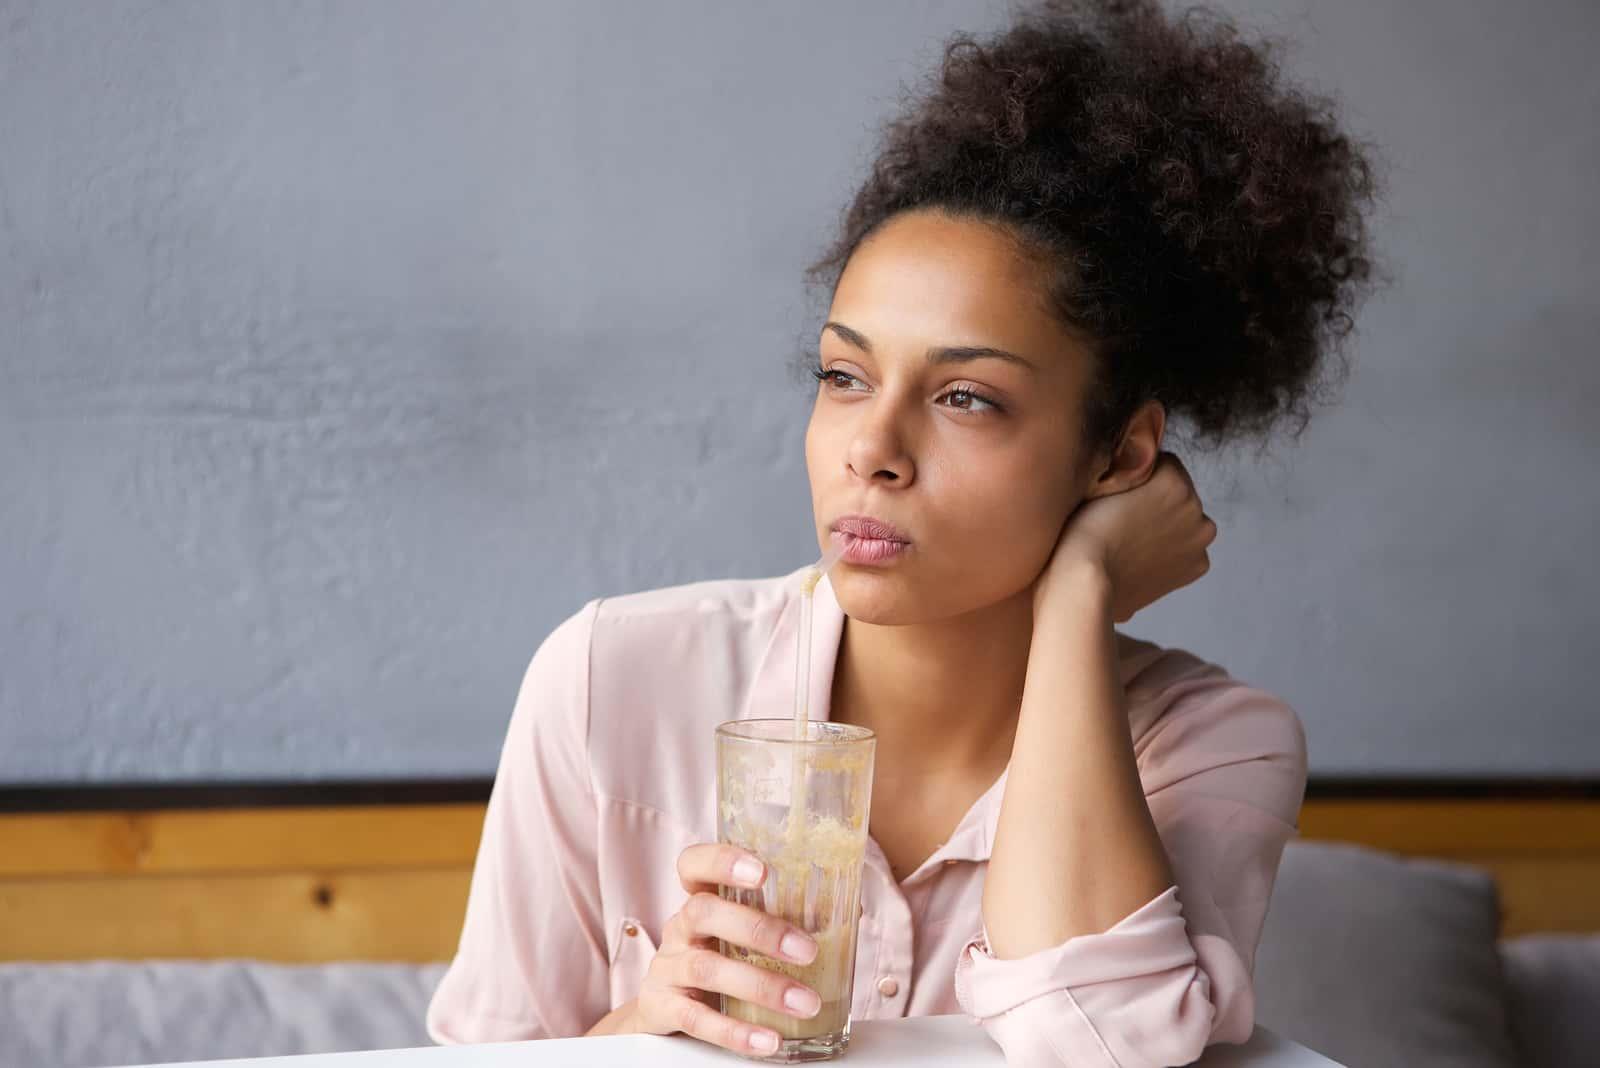 Frau trinkt Milchshake